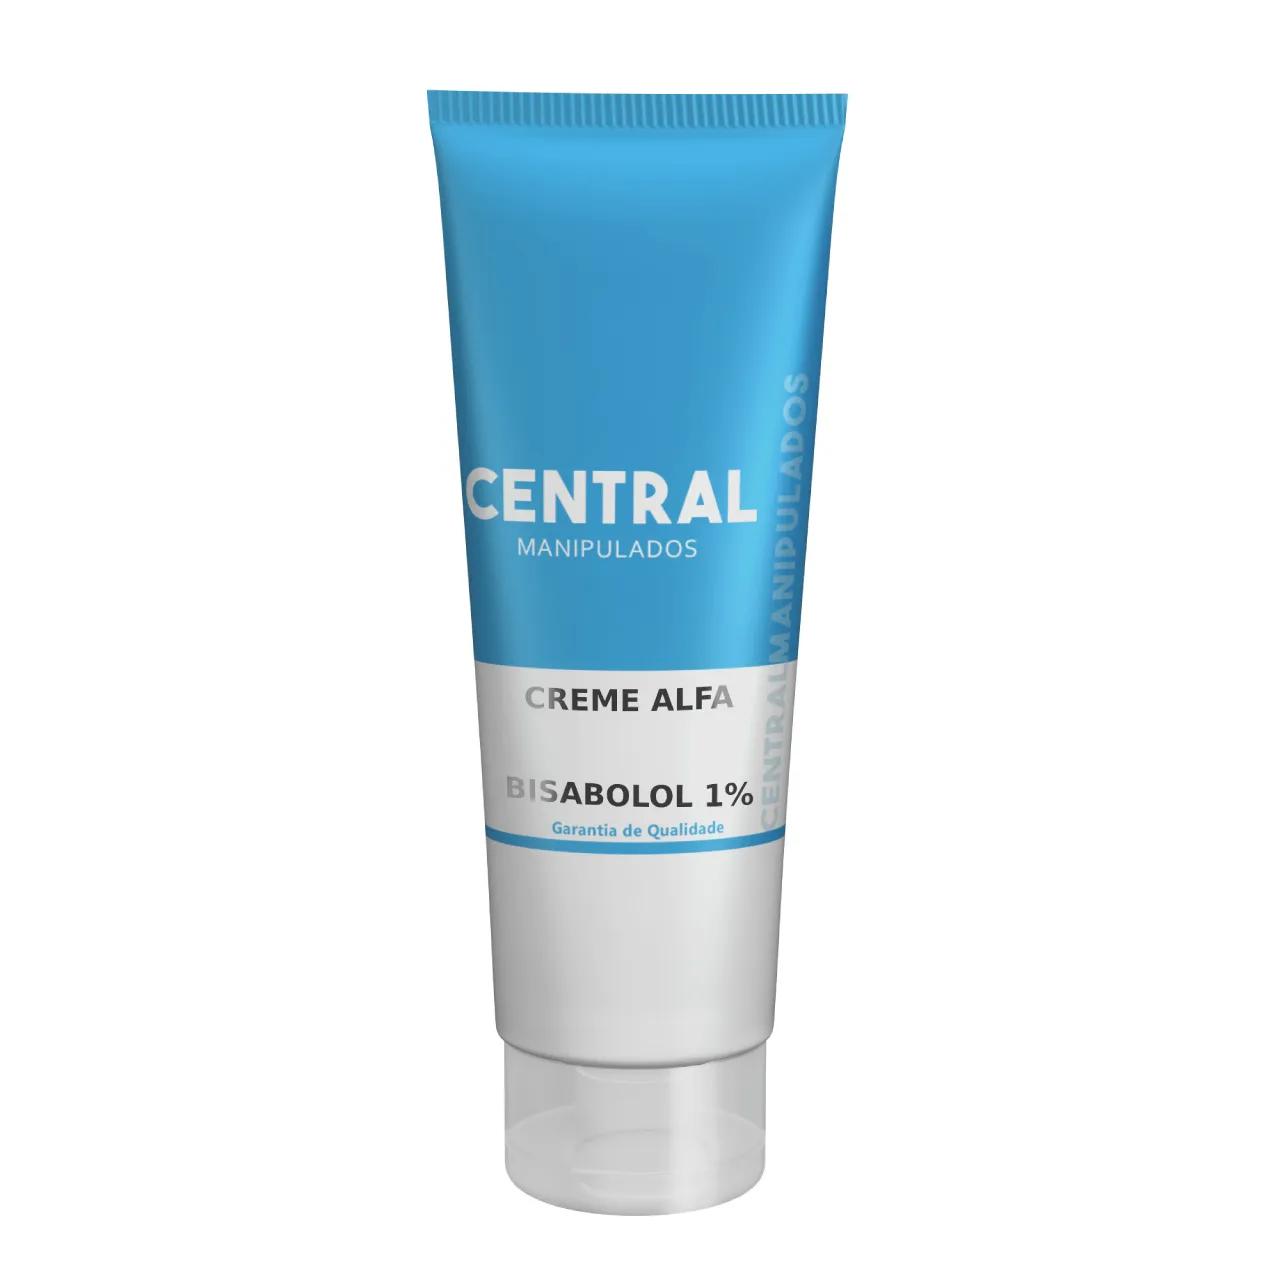 Alfa Bisabolol 1% Creme 30g - Anti-inflamatorio para a Pele, Tira as Manchas, Anti-acne, Cicatrizante